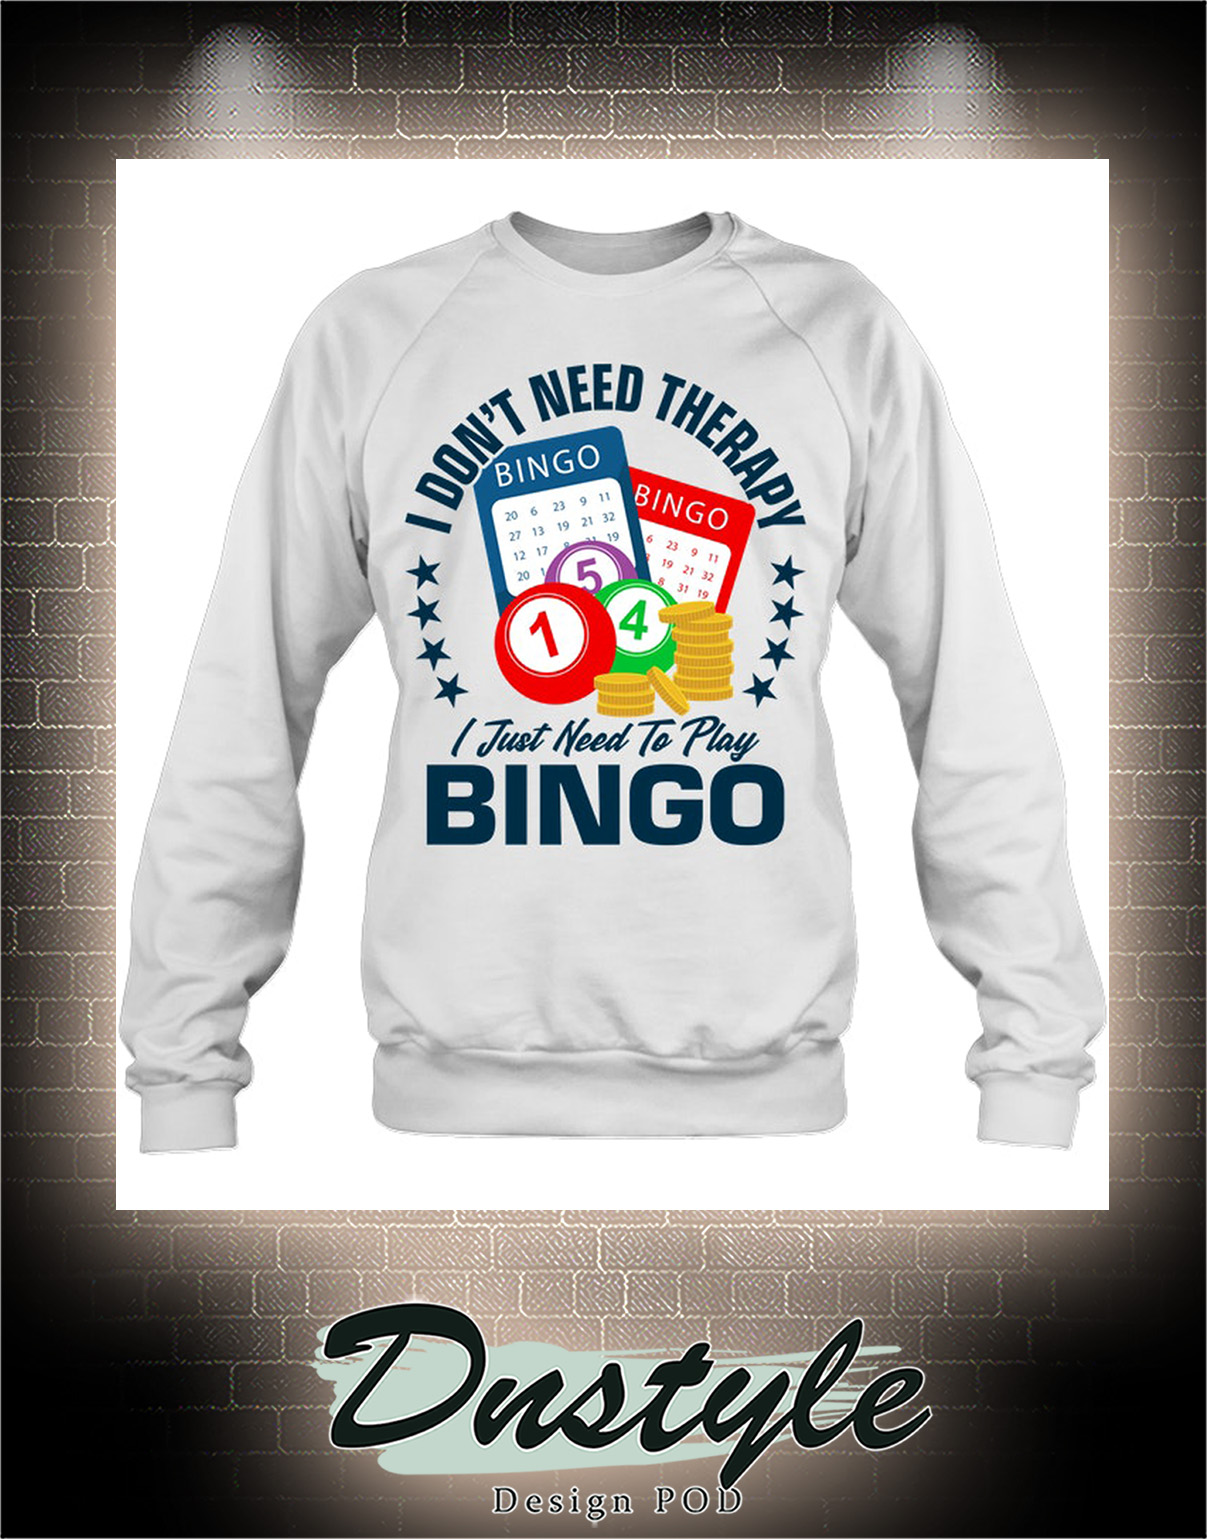 I don't need therapy I just need to play bingo sweatshirt